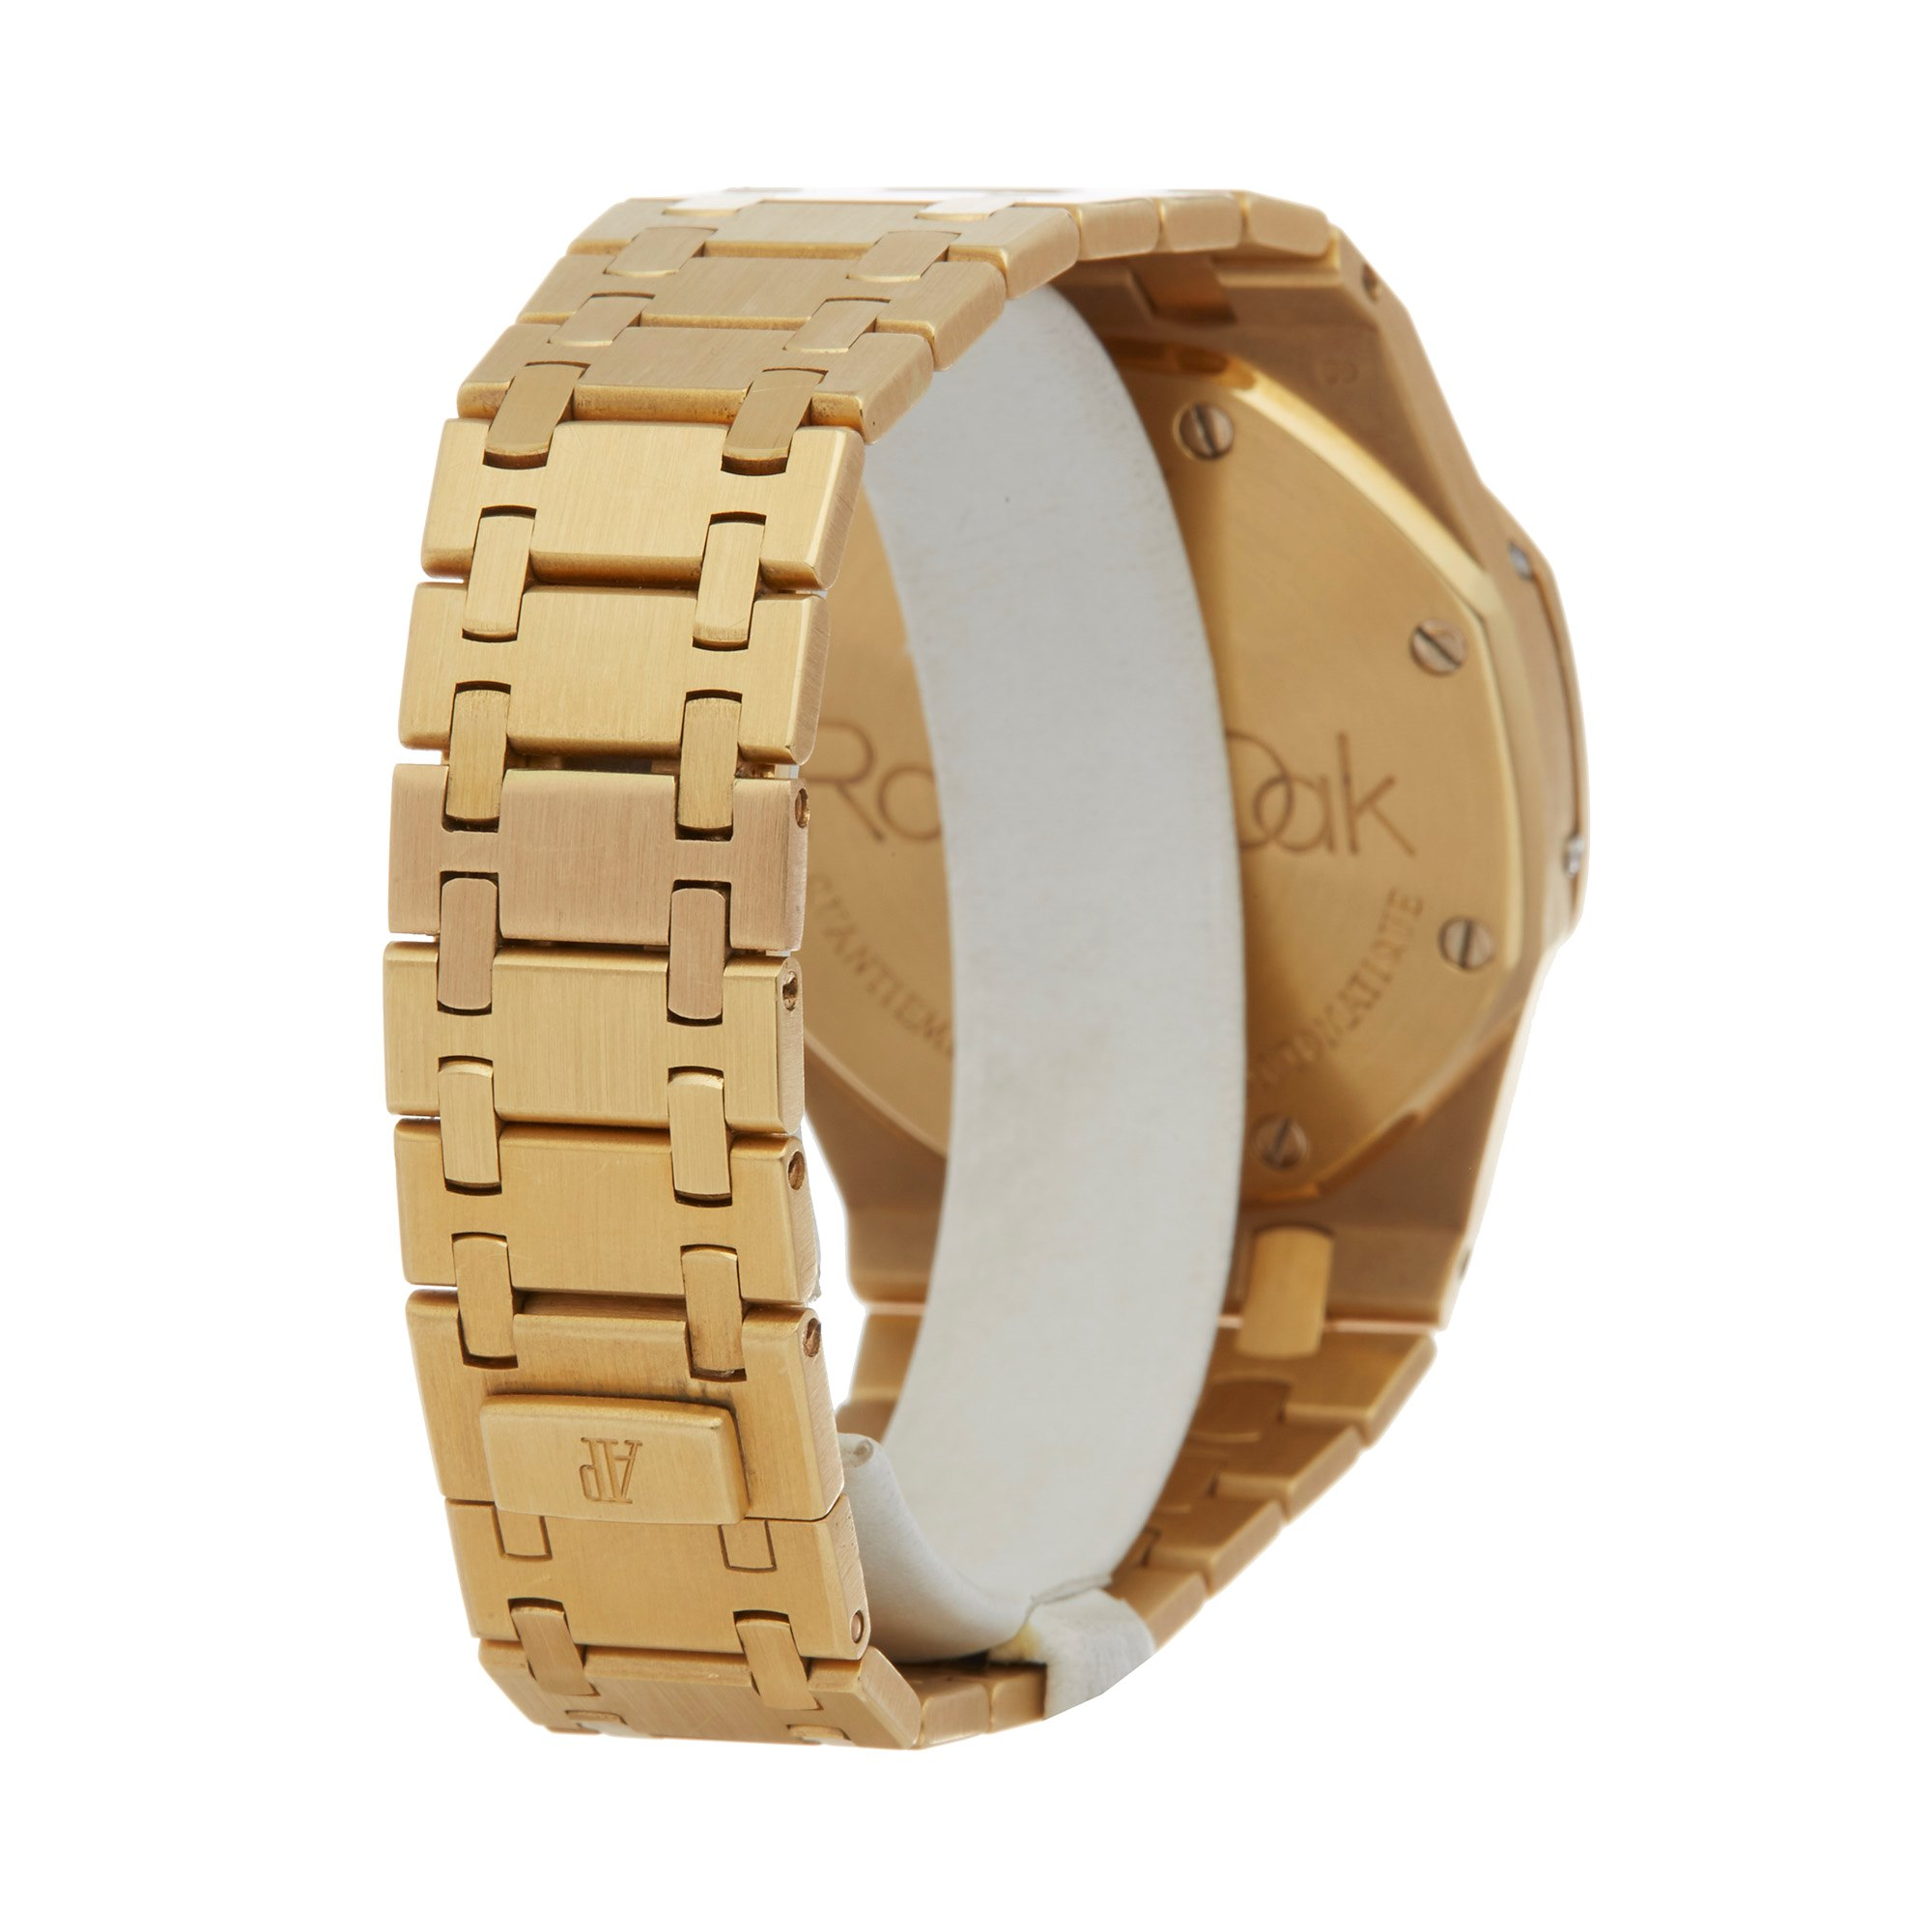 Audemars Piguet Royal Oak Perpetual Calendar Tuscan Dial 1st Series 18K Yellow Gold 25654BA.OO.0944BA.02